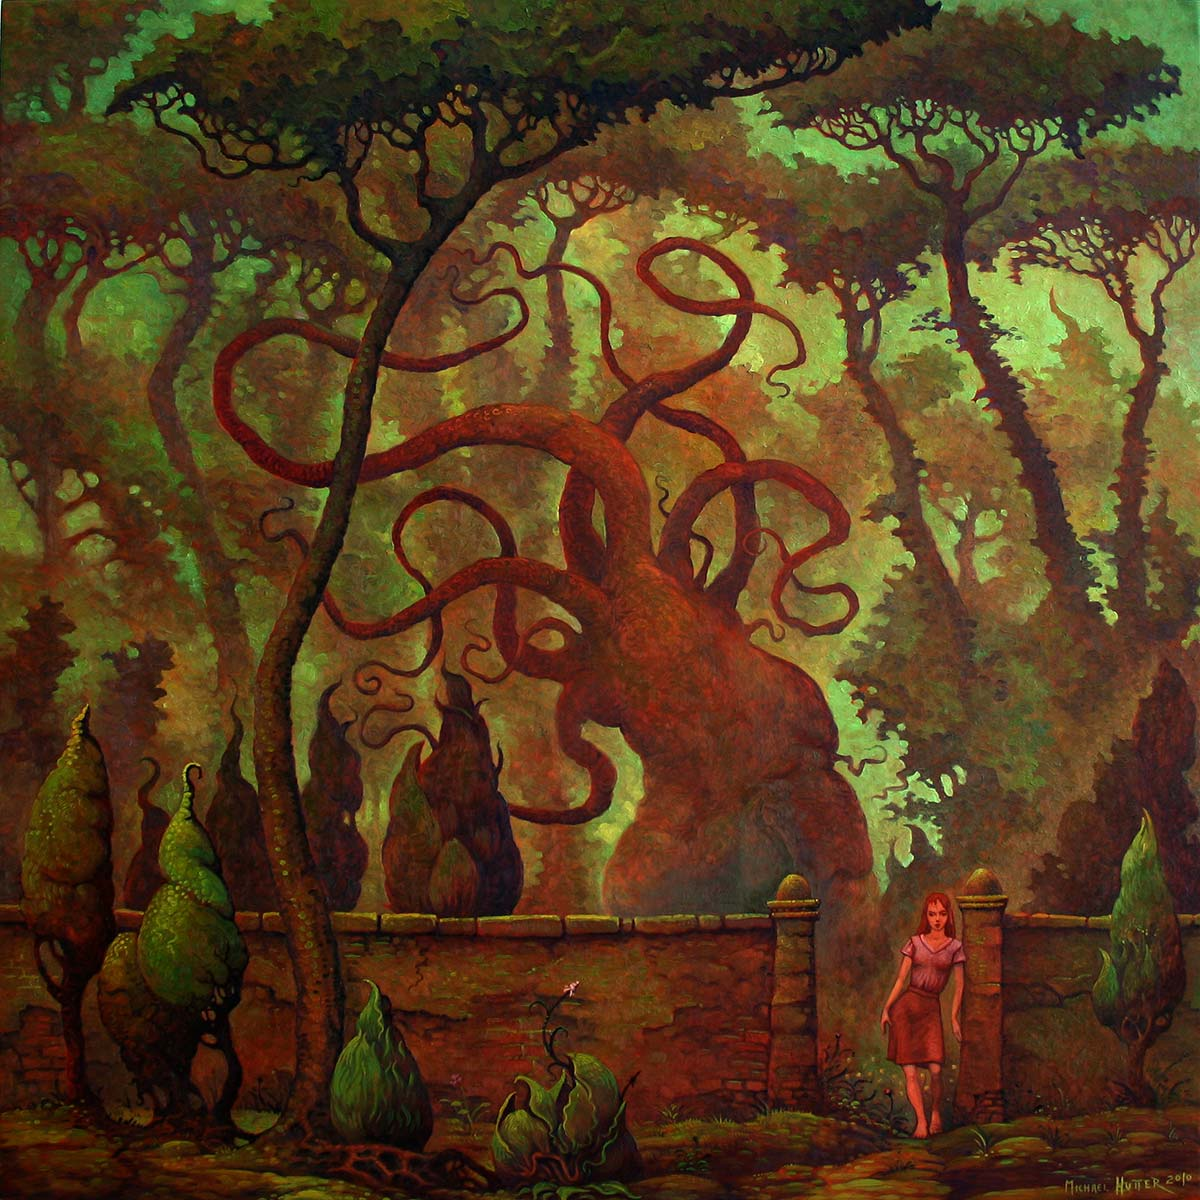 Alter-Garten-Michael-Hutter-painting-for-sale-87.jpg